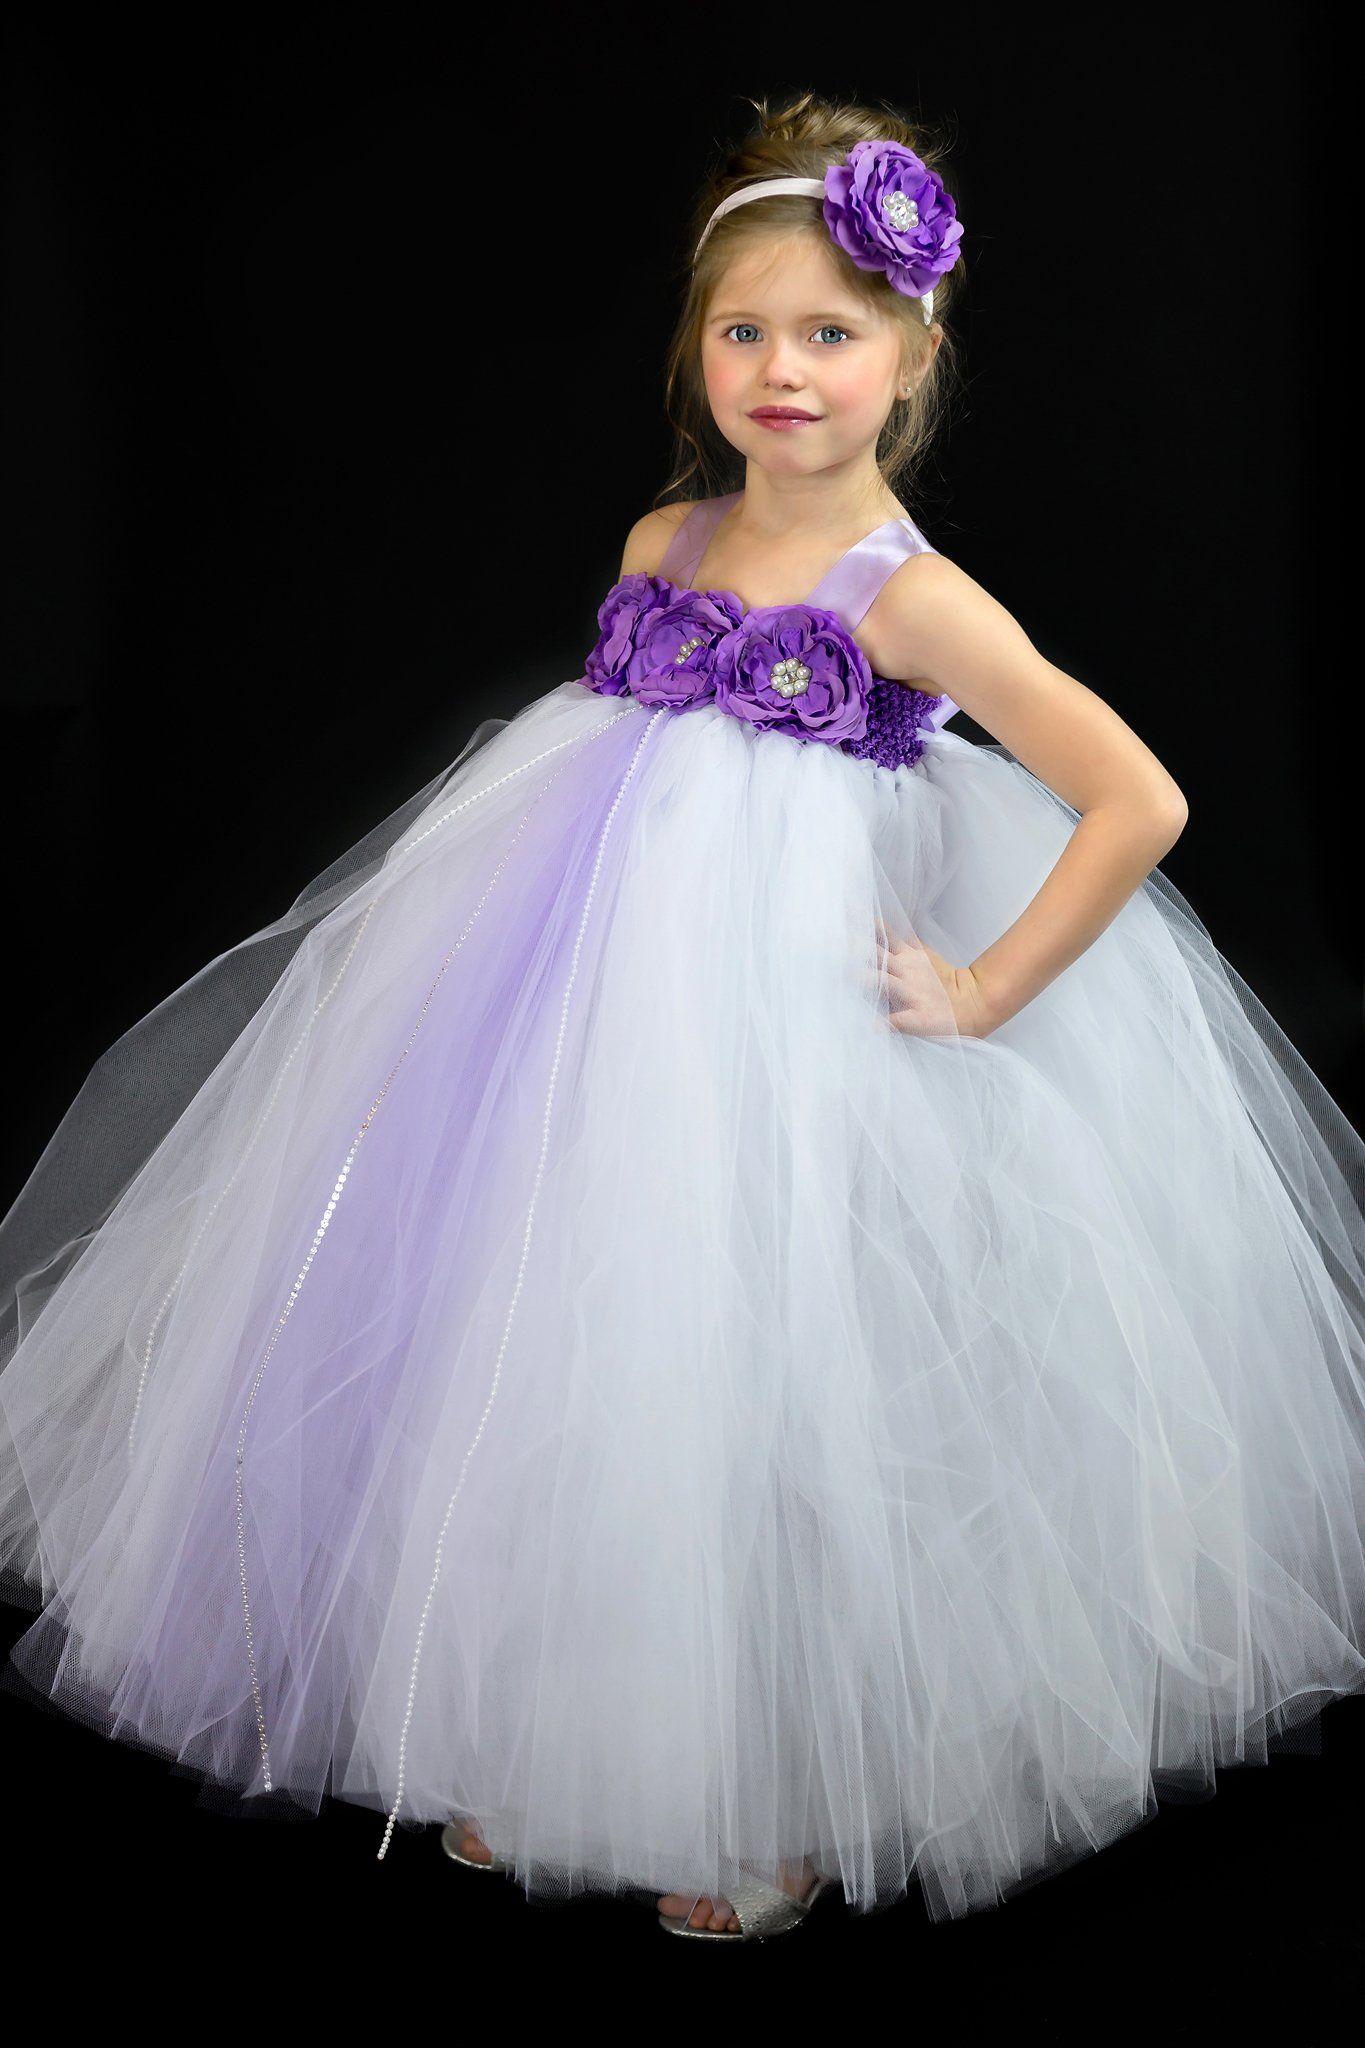 b469ce8a1 White and Purple Flower Girl Dress, White Tutu, Purple Flower Tutu, White  and Purple Wedding, Spring Wedding, Summer Wedding, White Wedding, Purple  Wedding, ...